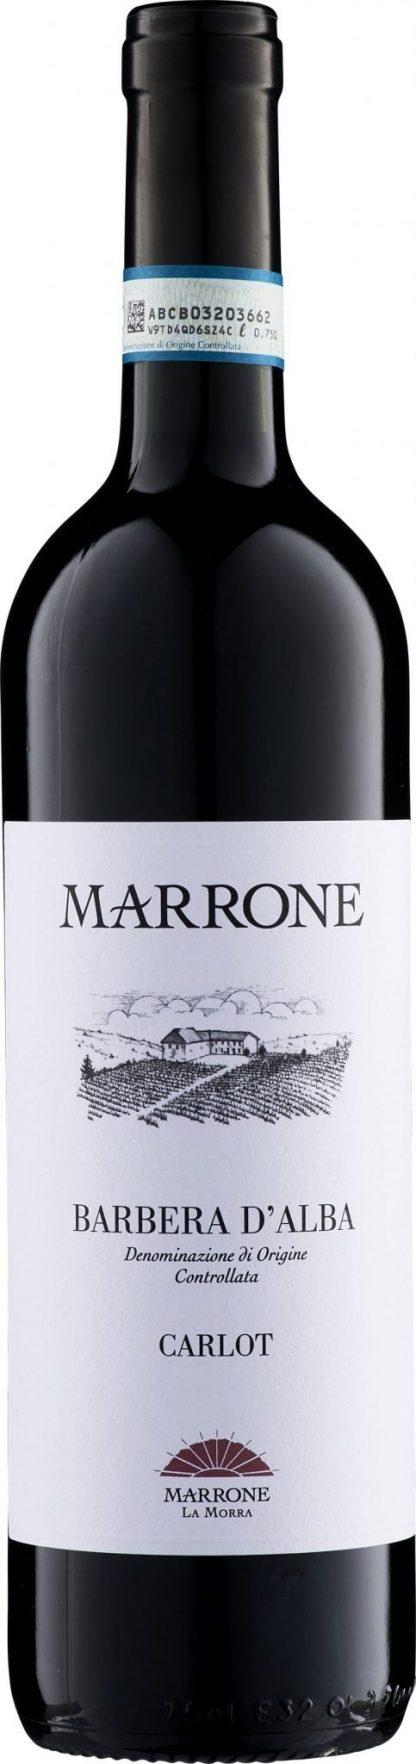 "Marrone - Barbera D'Alba DOC ""Carlot"" 2018"